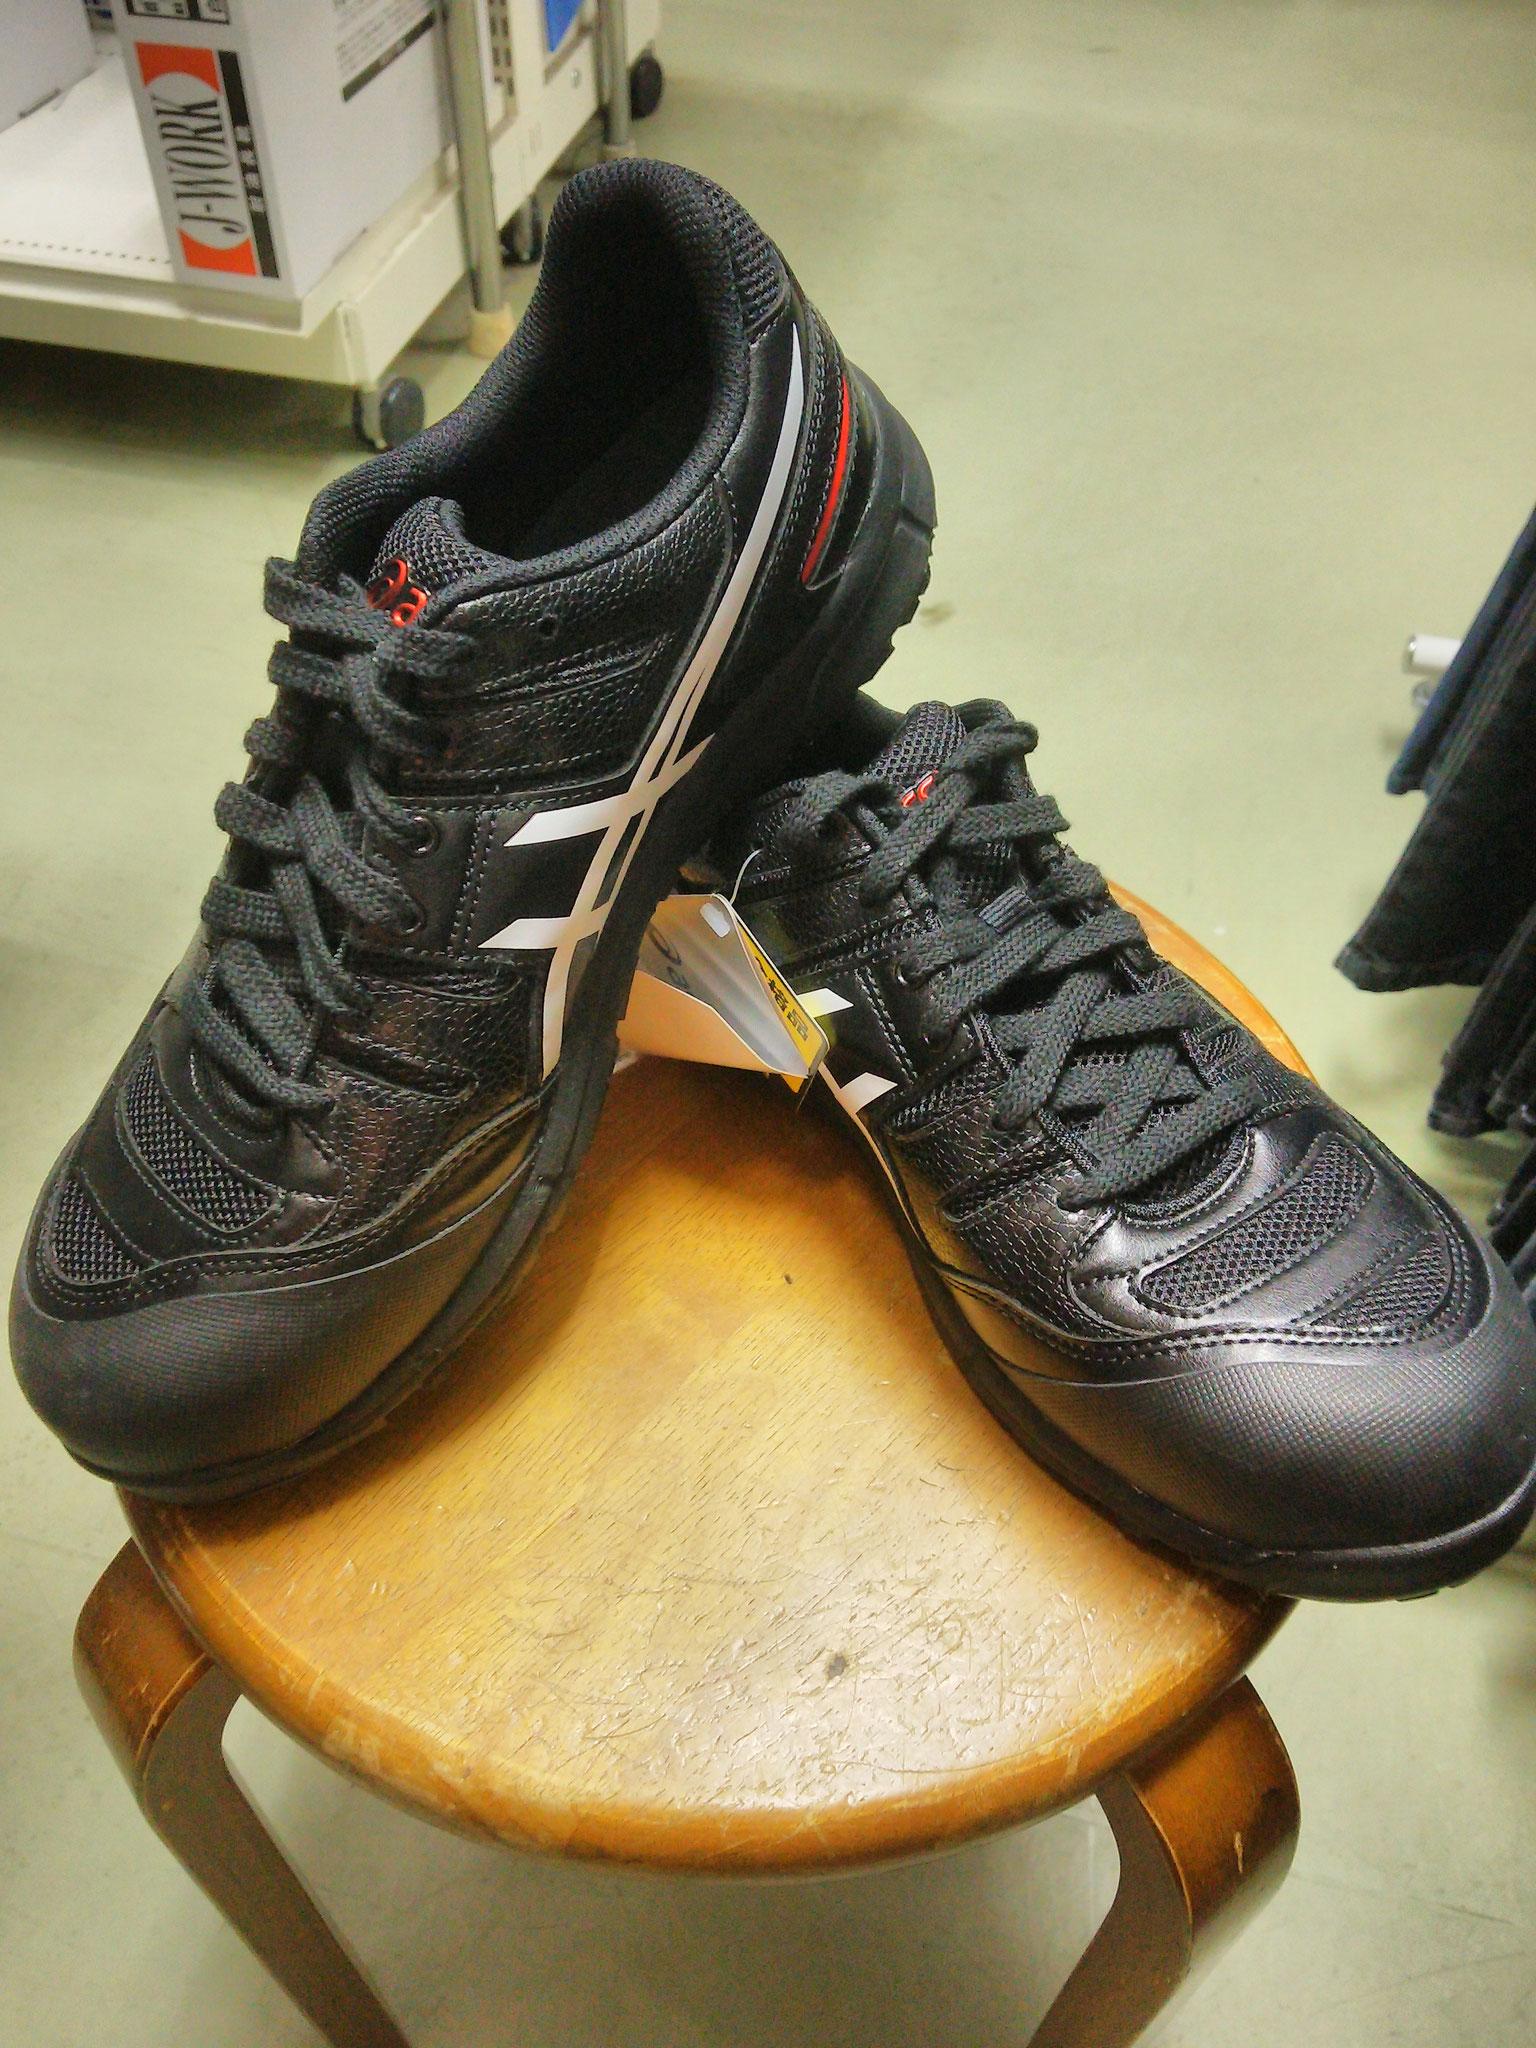 CP103 アシックス安全スニーカー ブラック ¥8,500(税込)